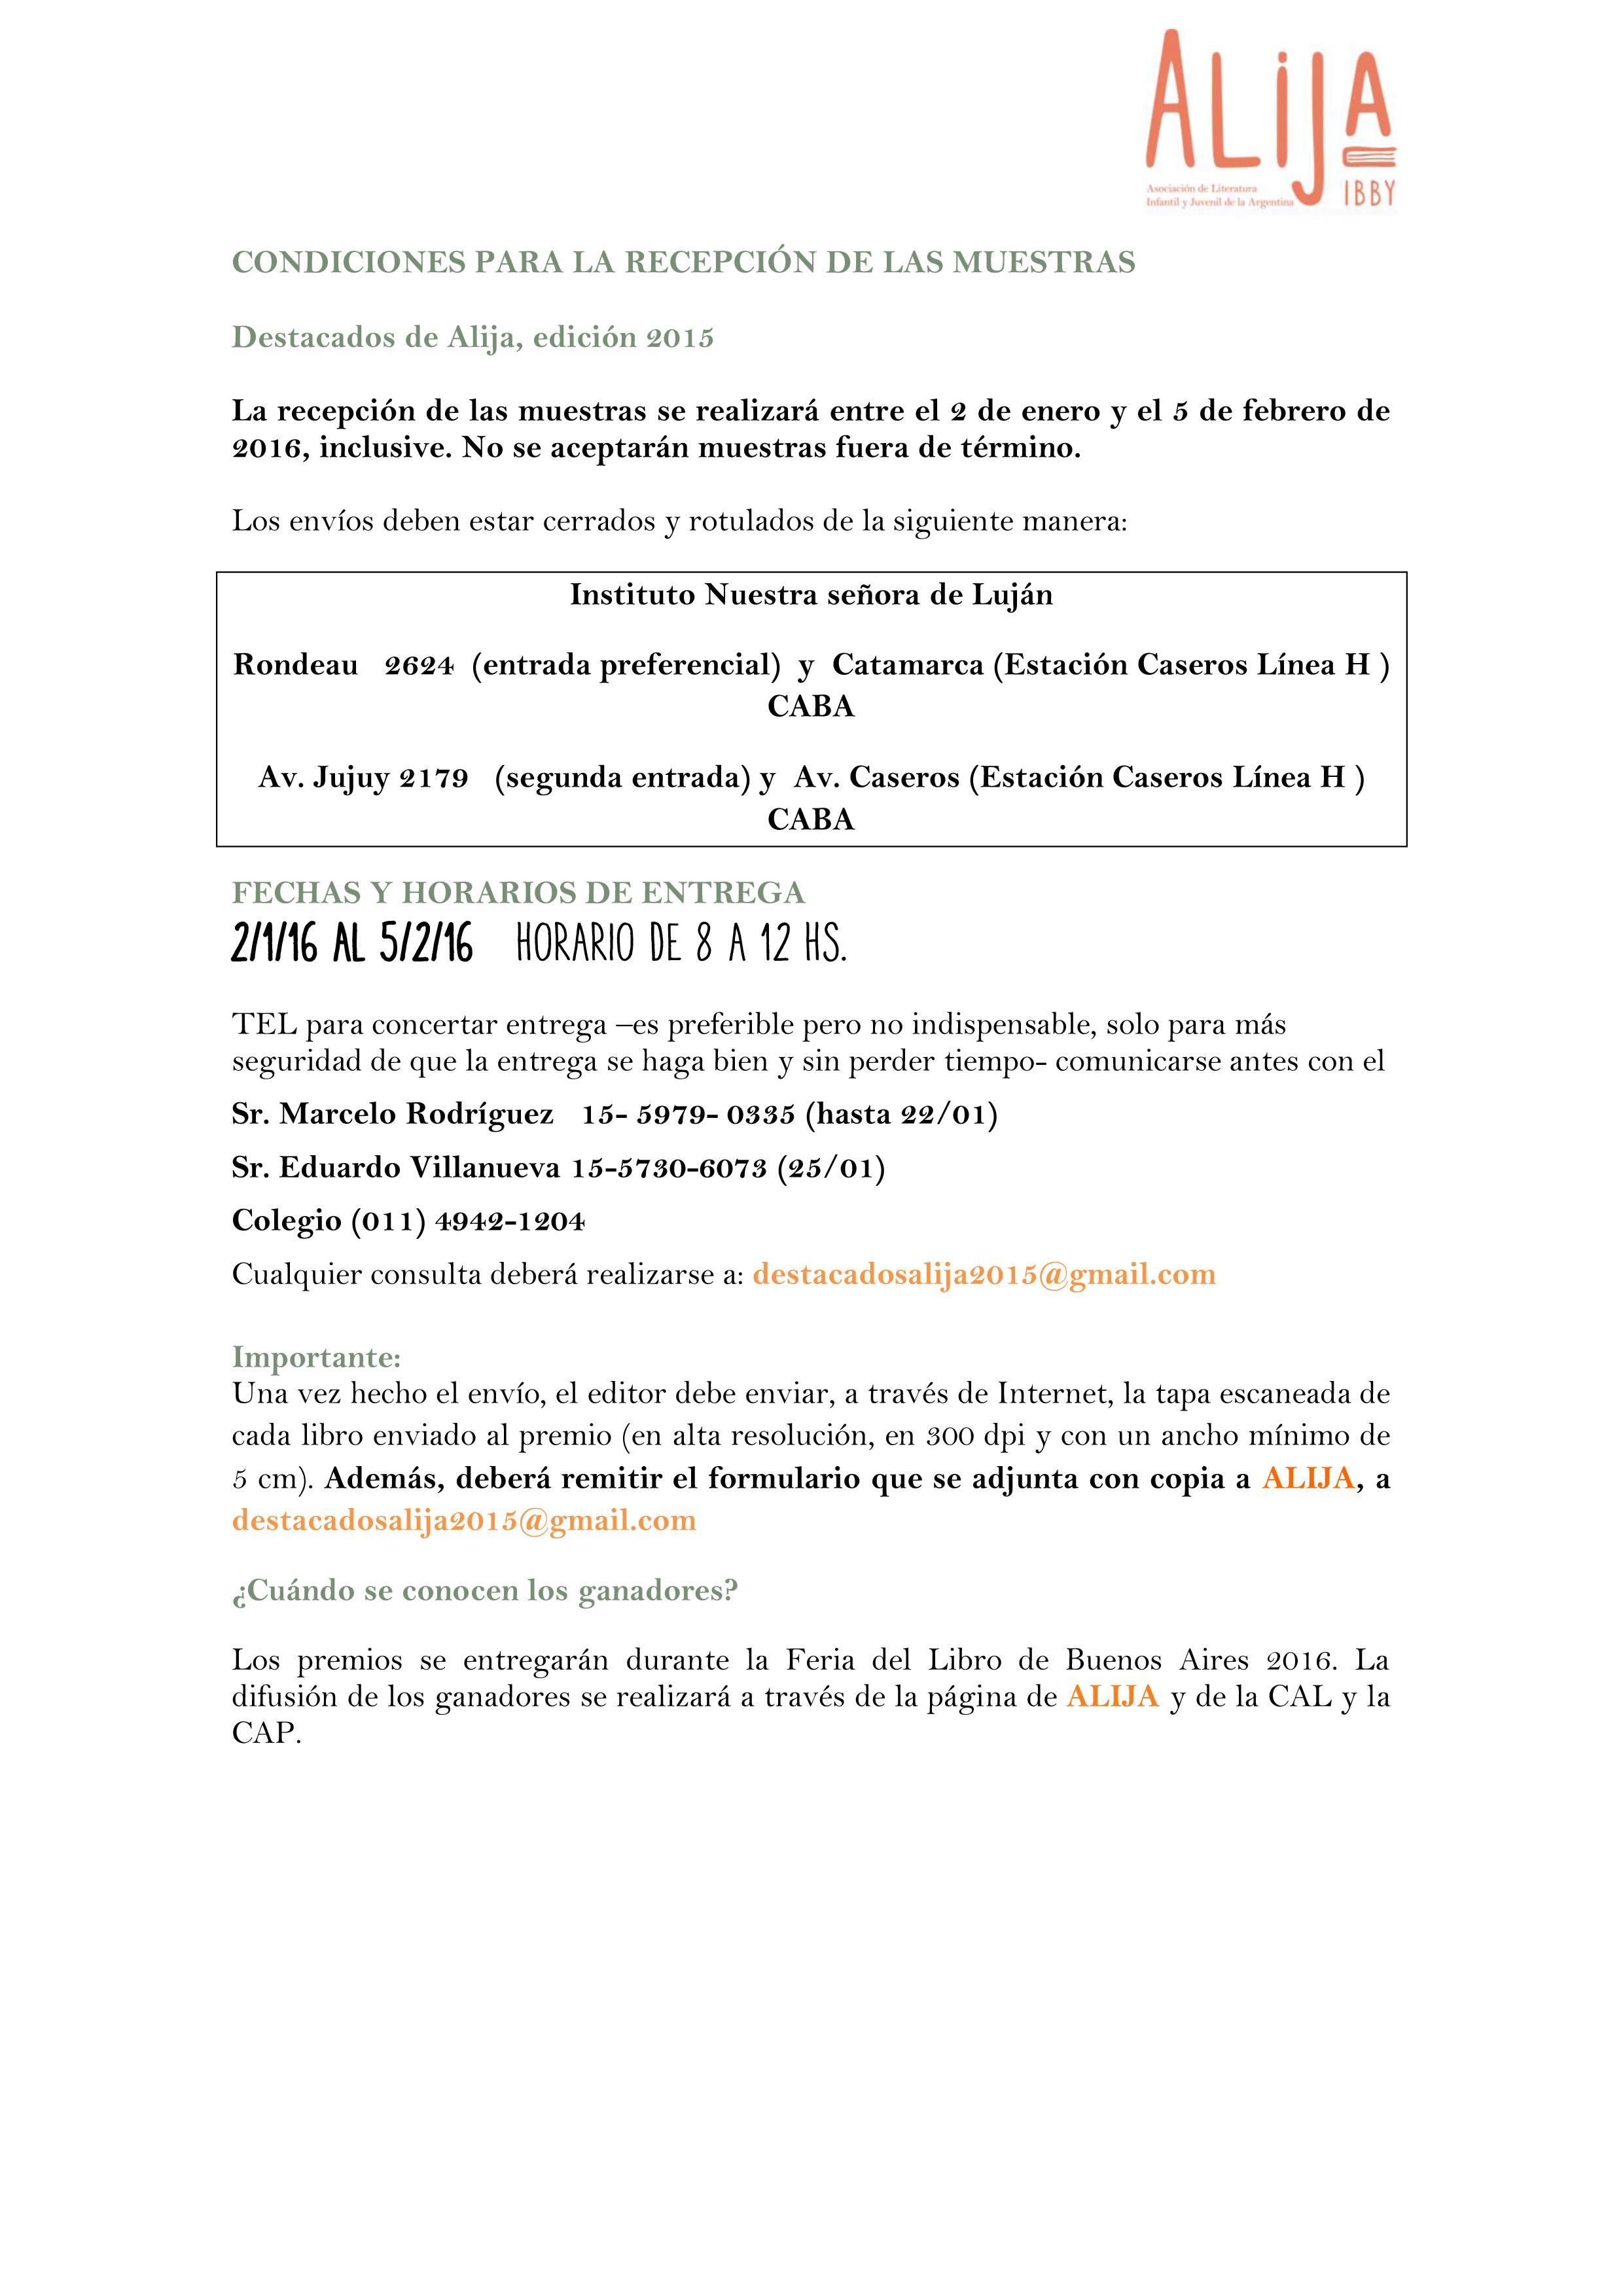 BasesPREMIOLOSDESTACADOSDEALIJA2015-3